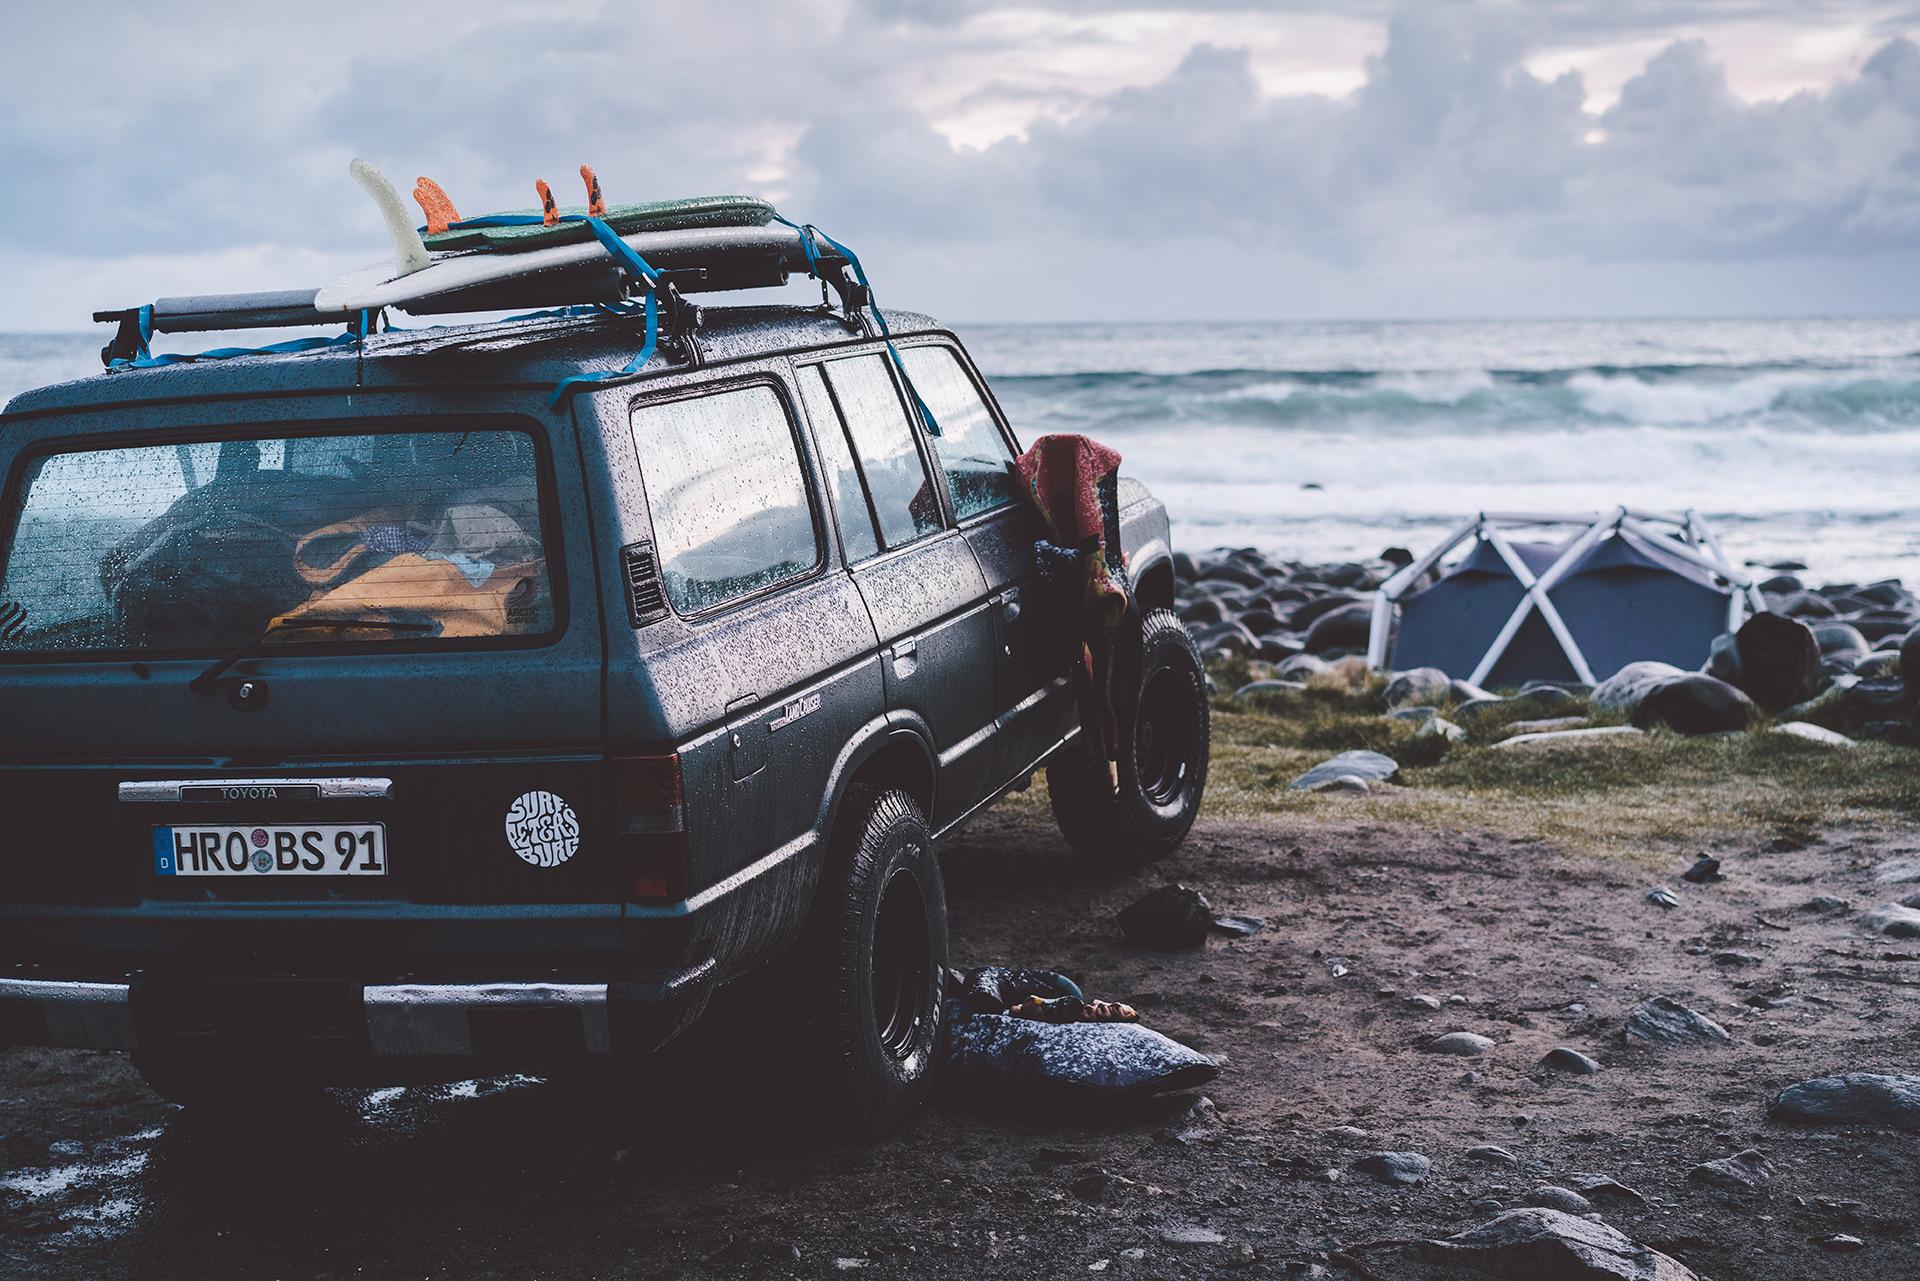 auto-surfer-equipment-strand-norwegen